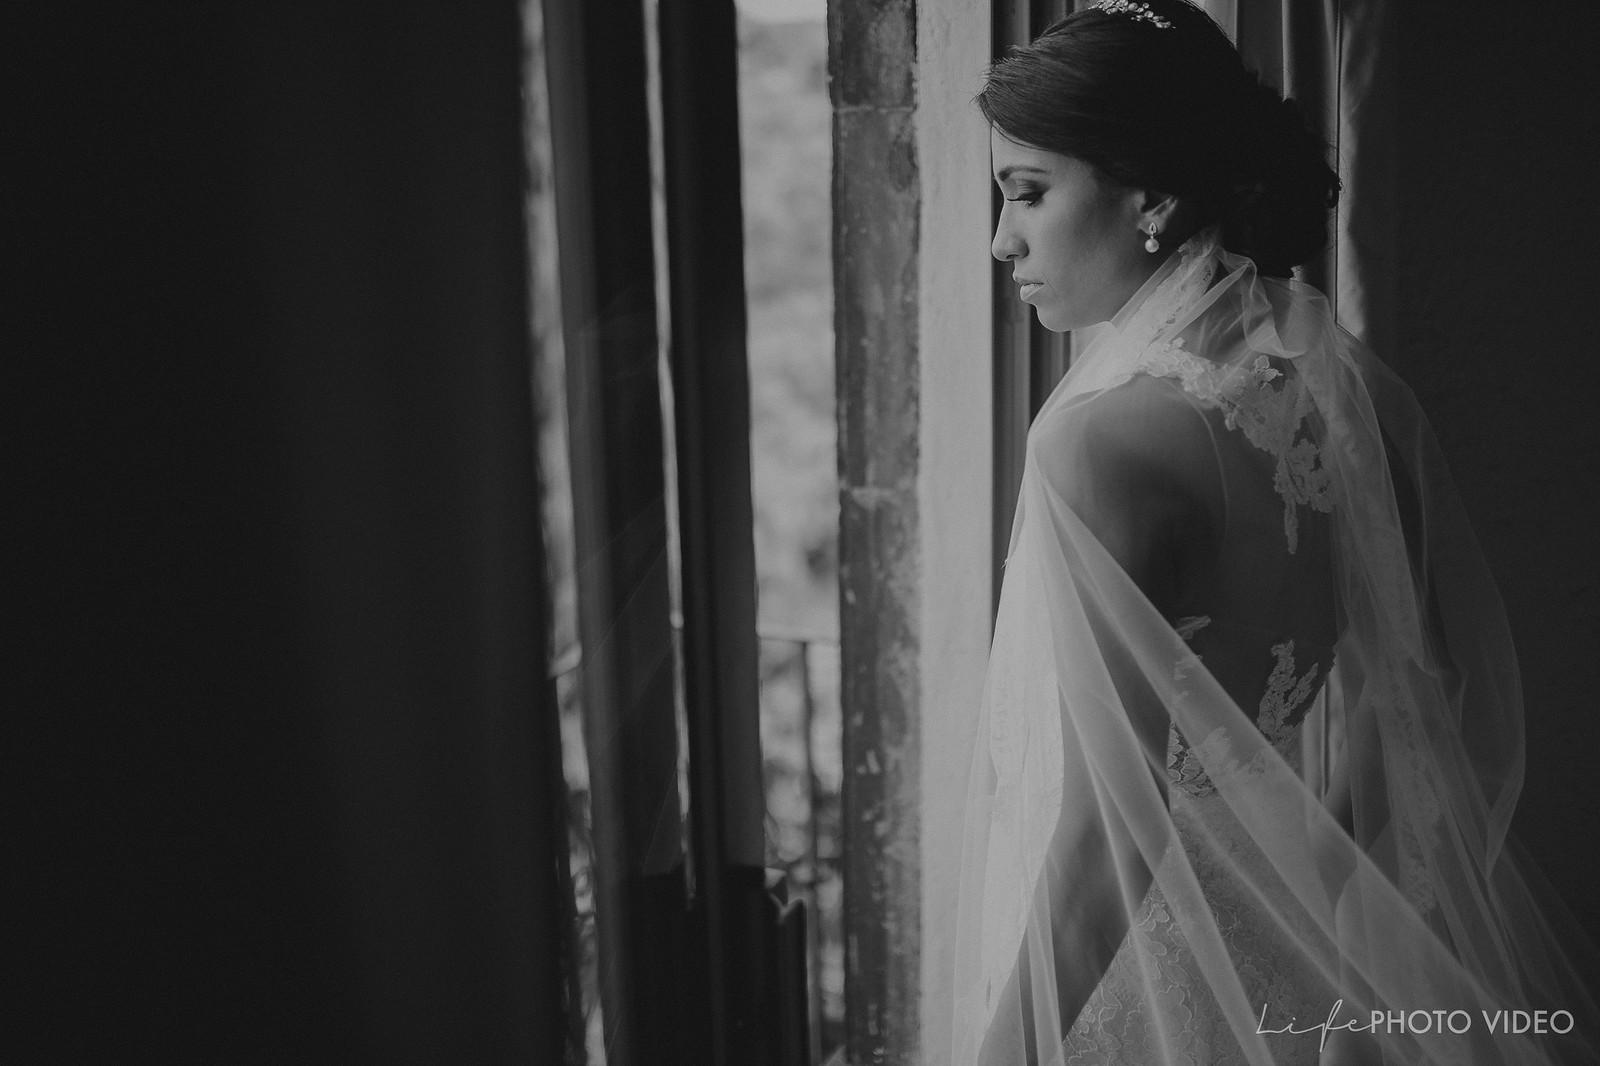 LifePhotoVideo_Boda_Guanajuato_Wedding_0014